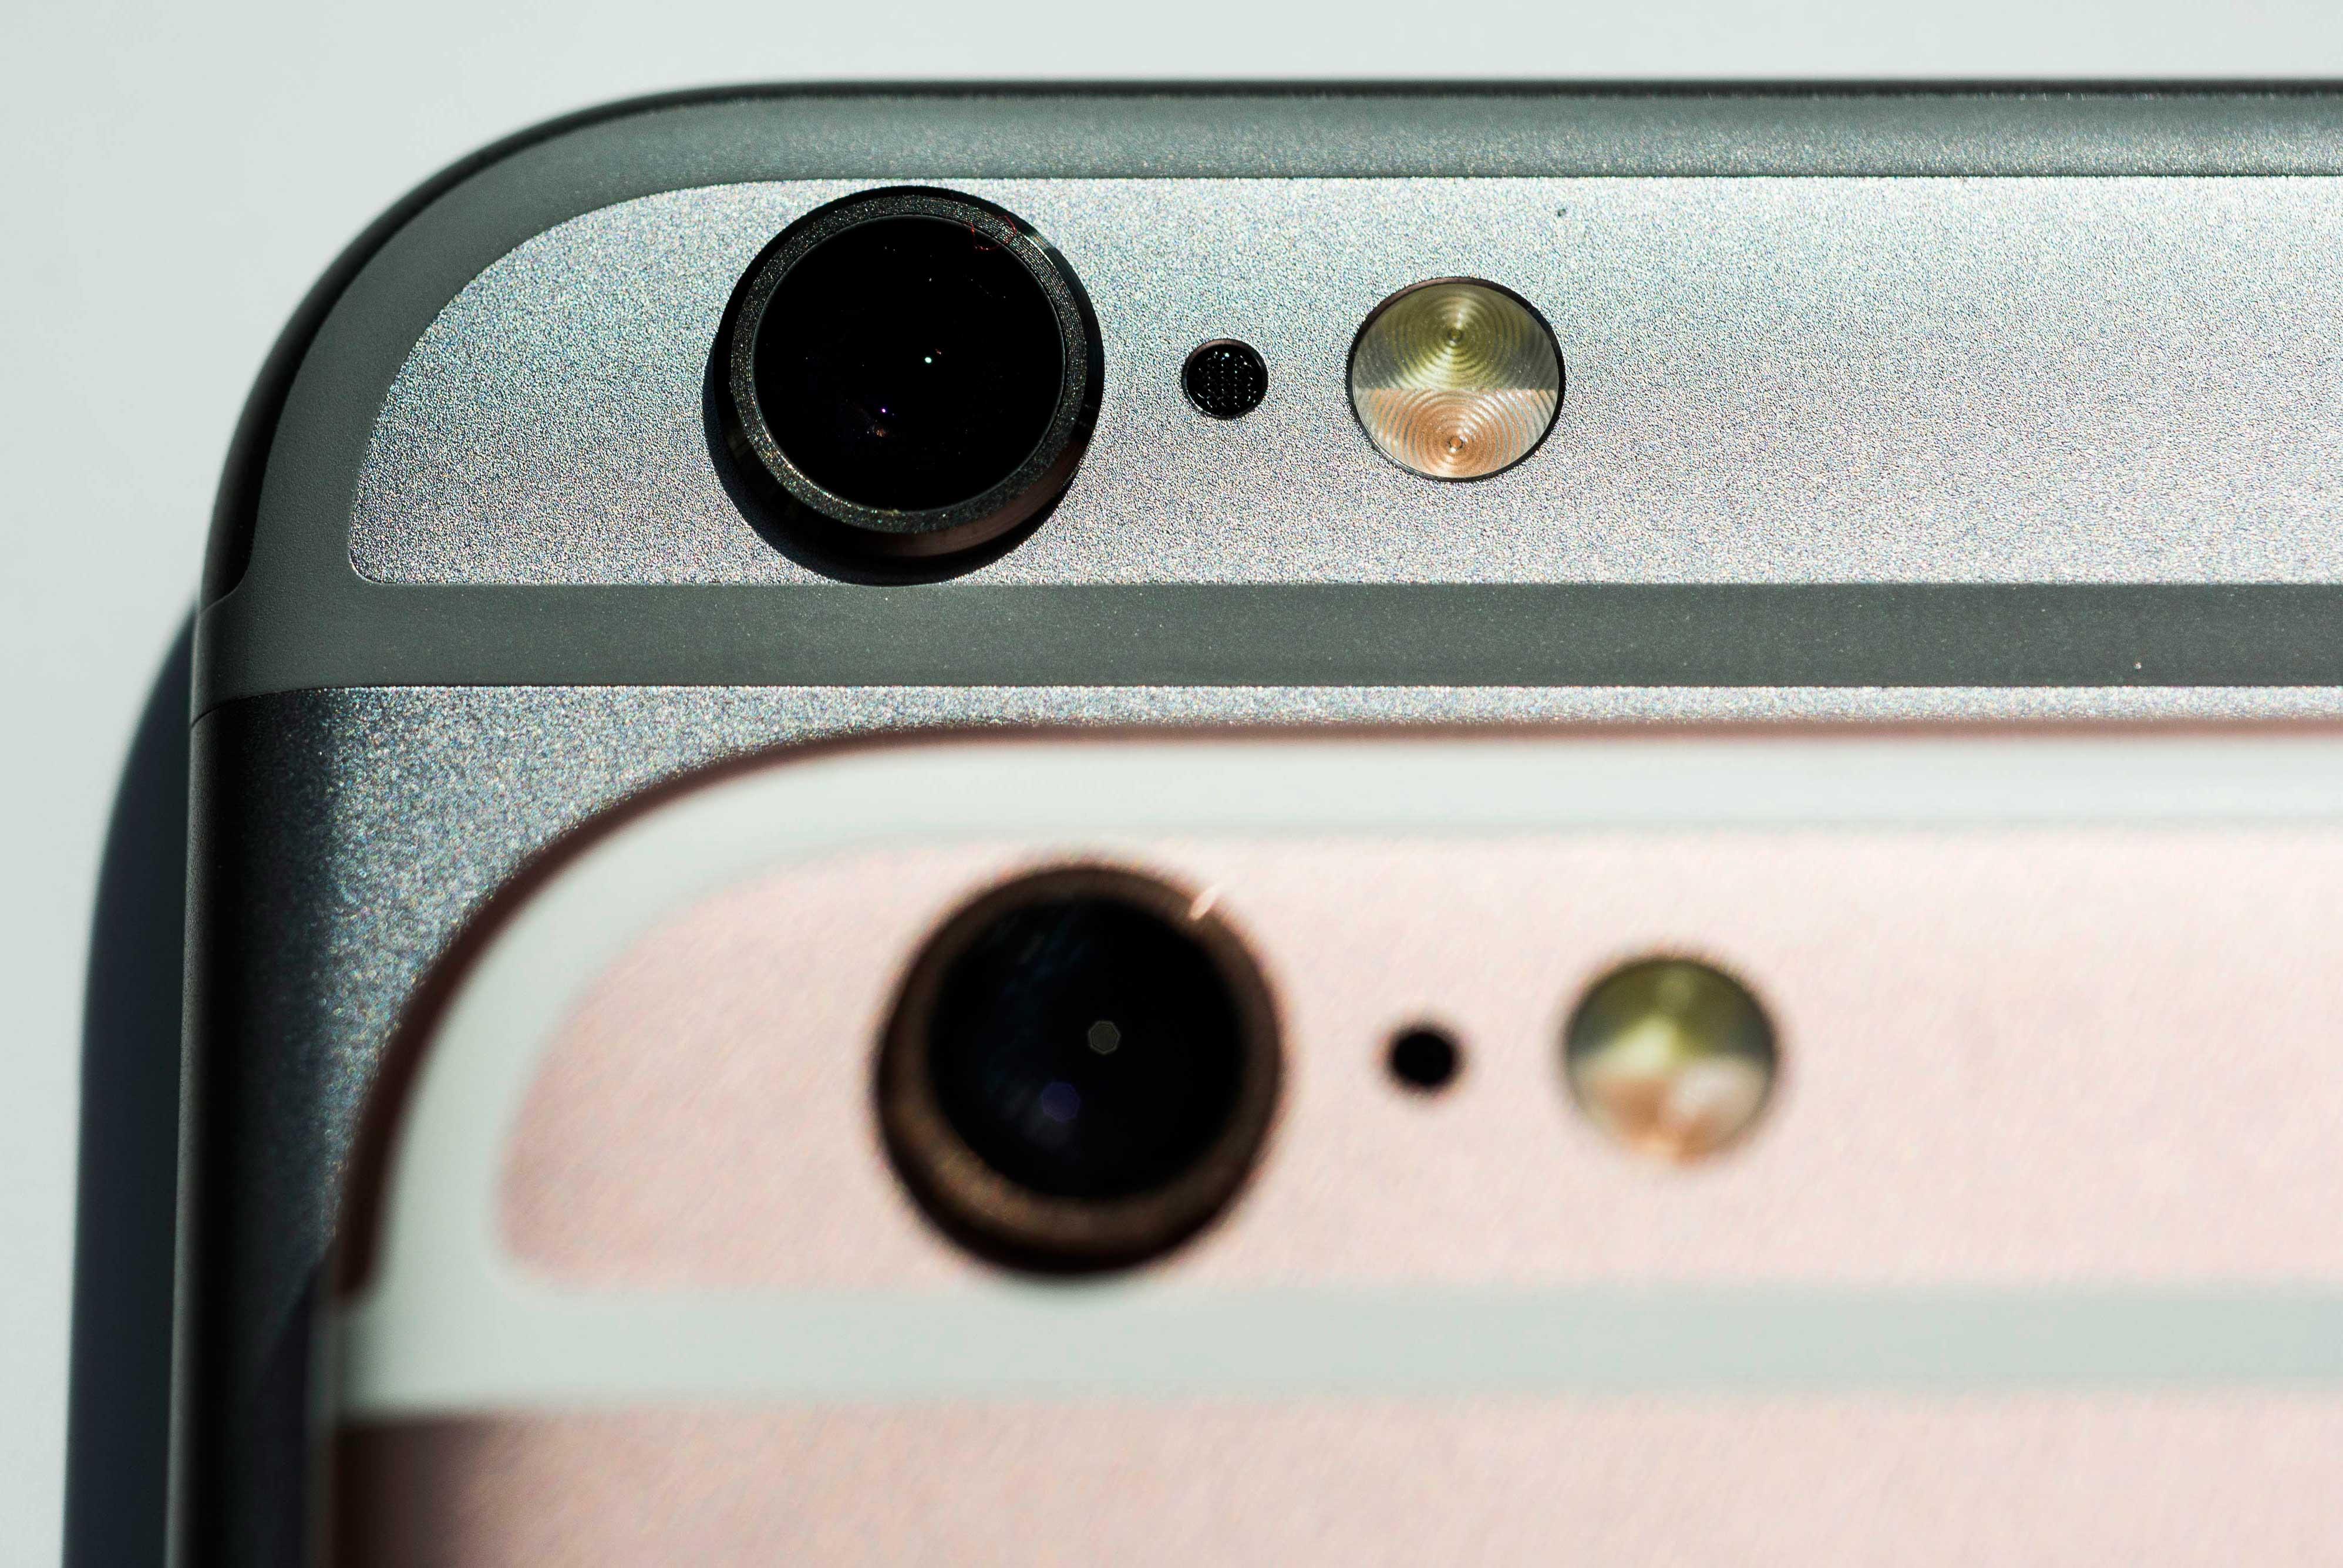 Unboxing Apple Inc. iPhone 6s